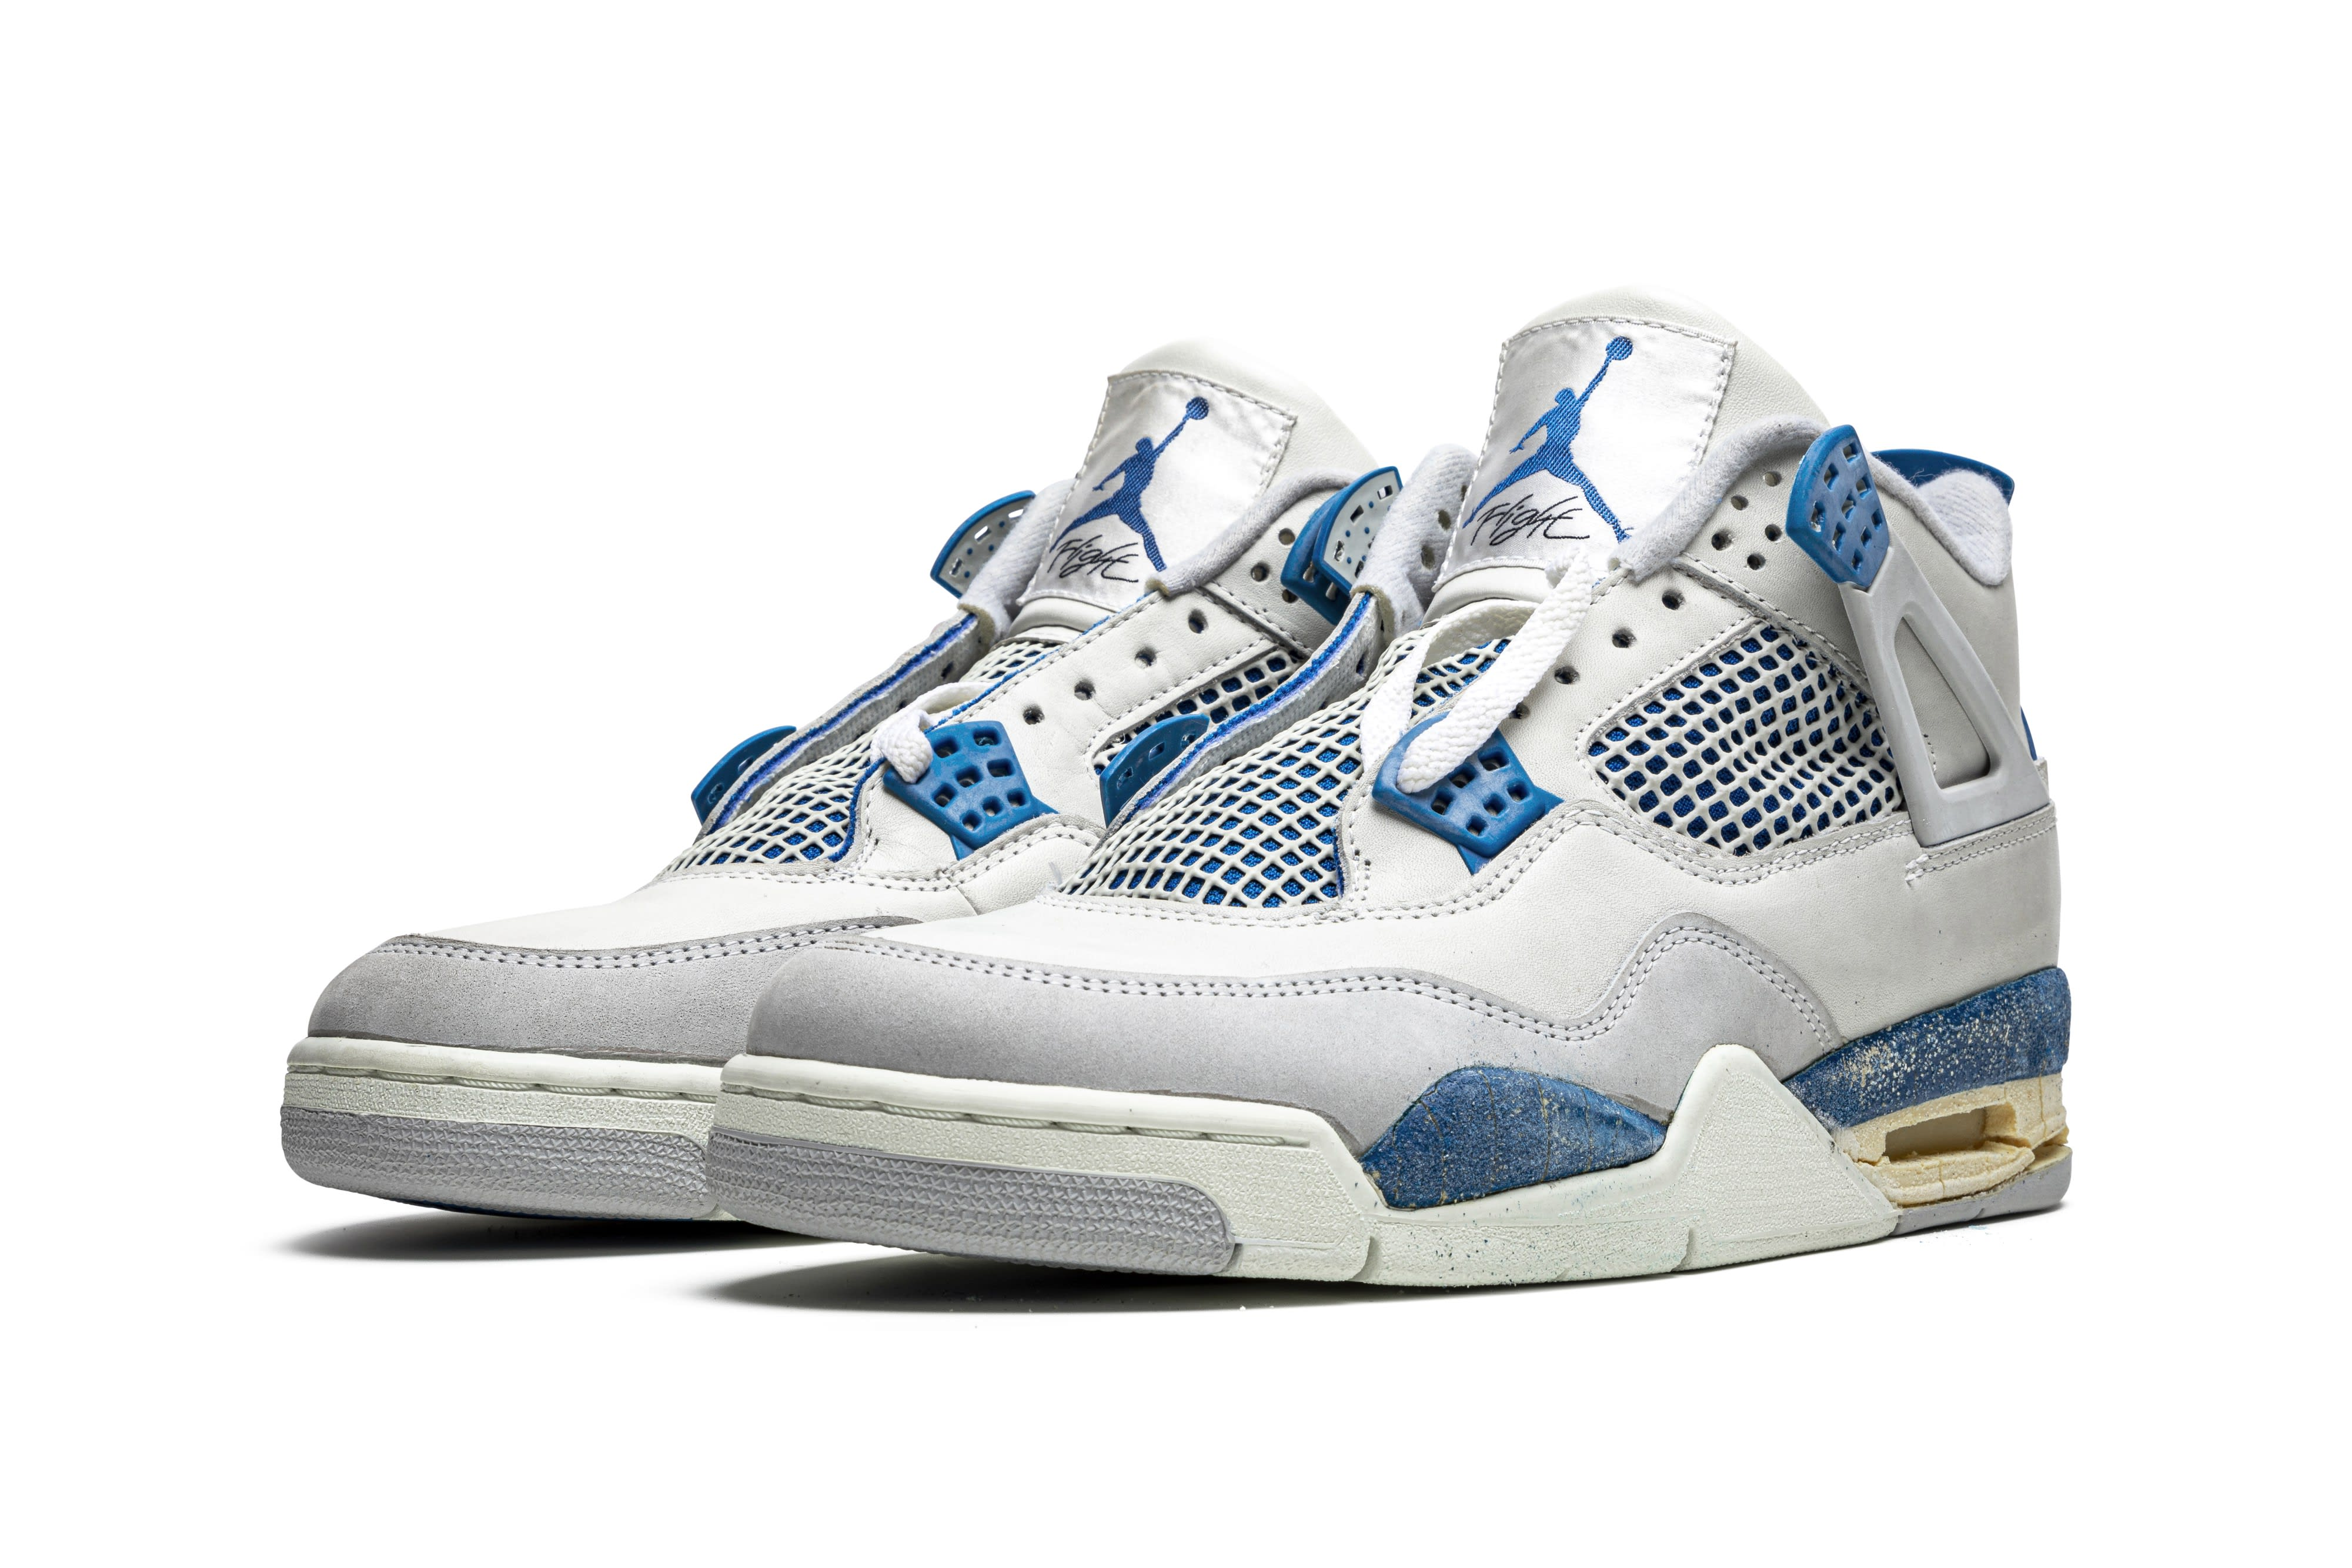 Air Jordan 4 'Military Blue' OG